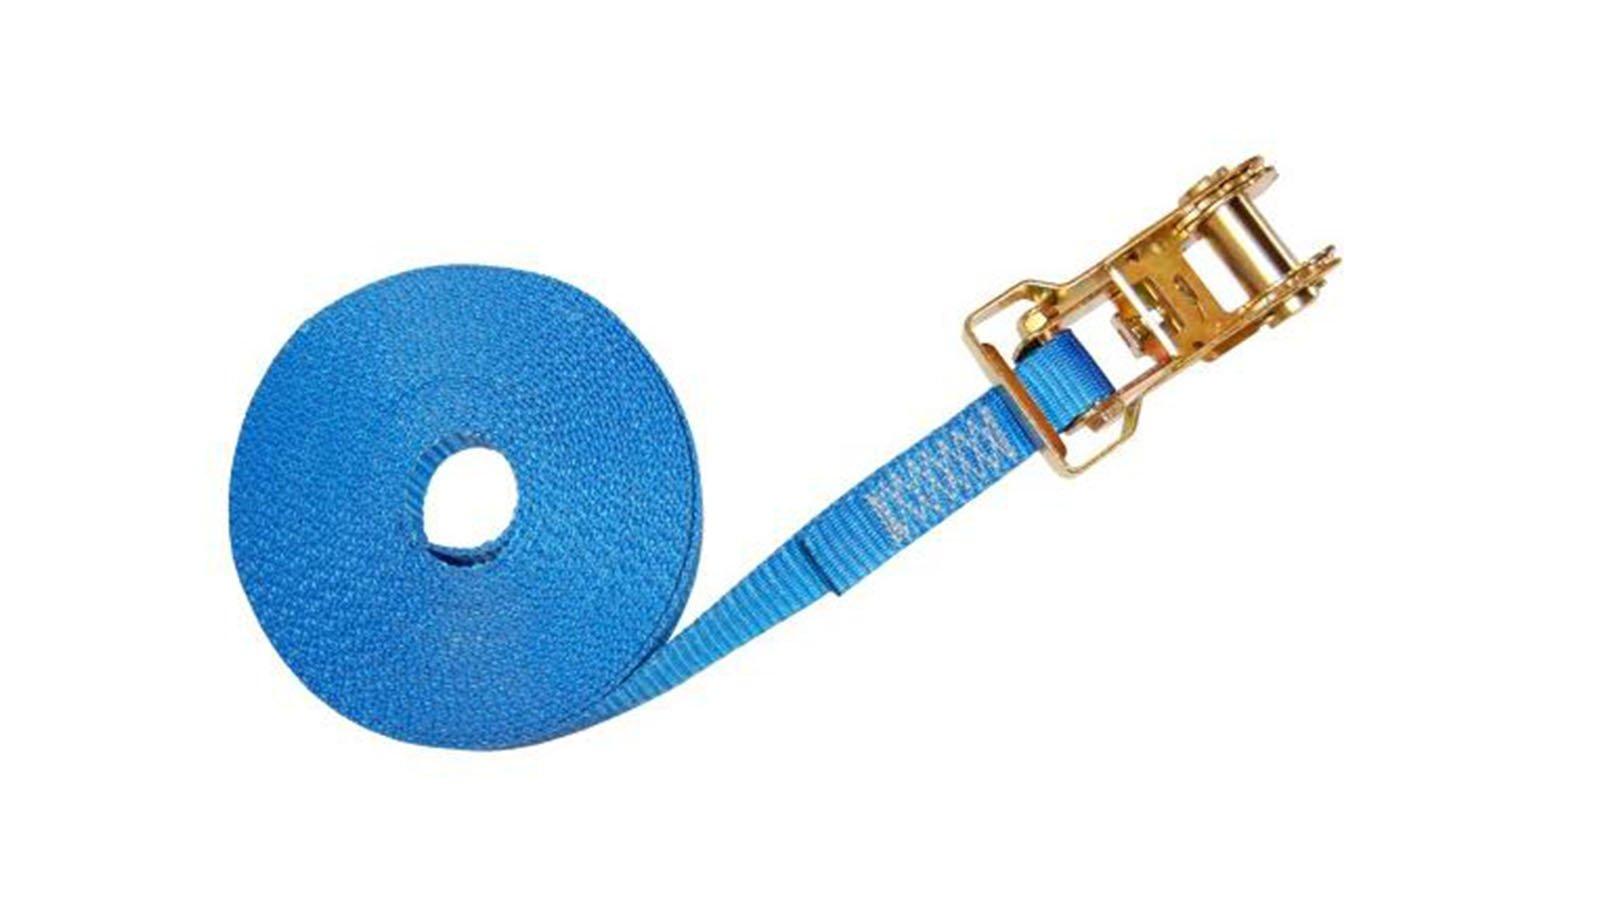 Spanband 25 mm LC 750 - 1500 daN